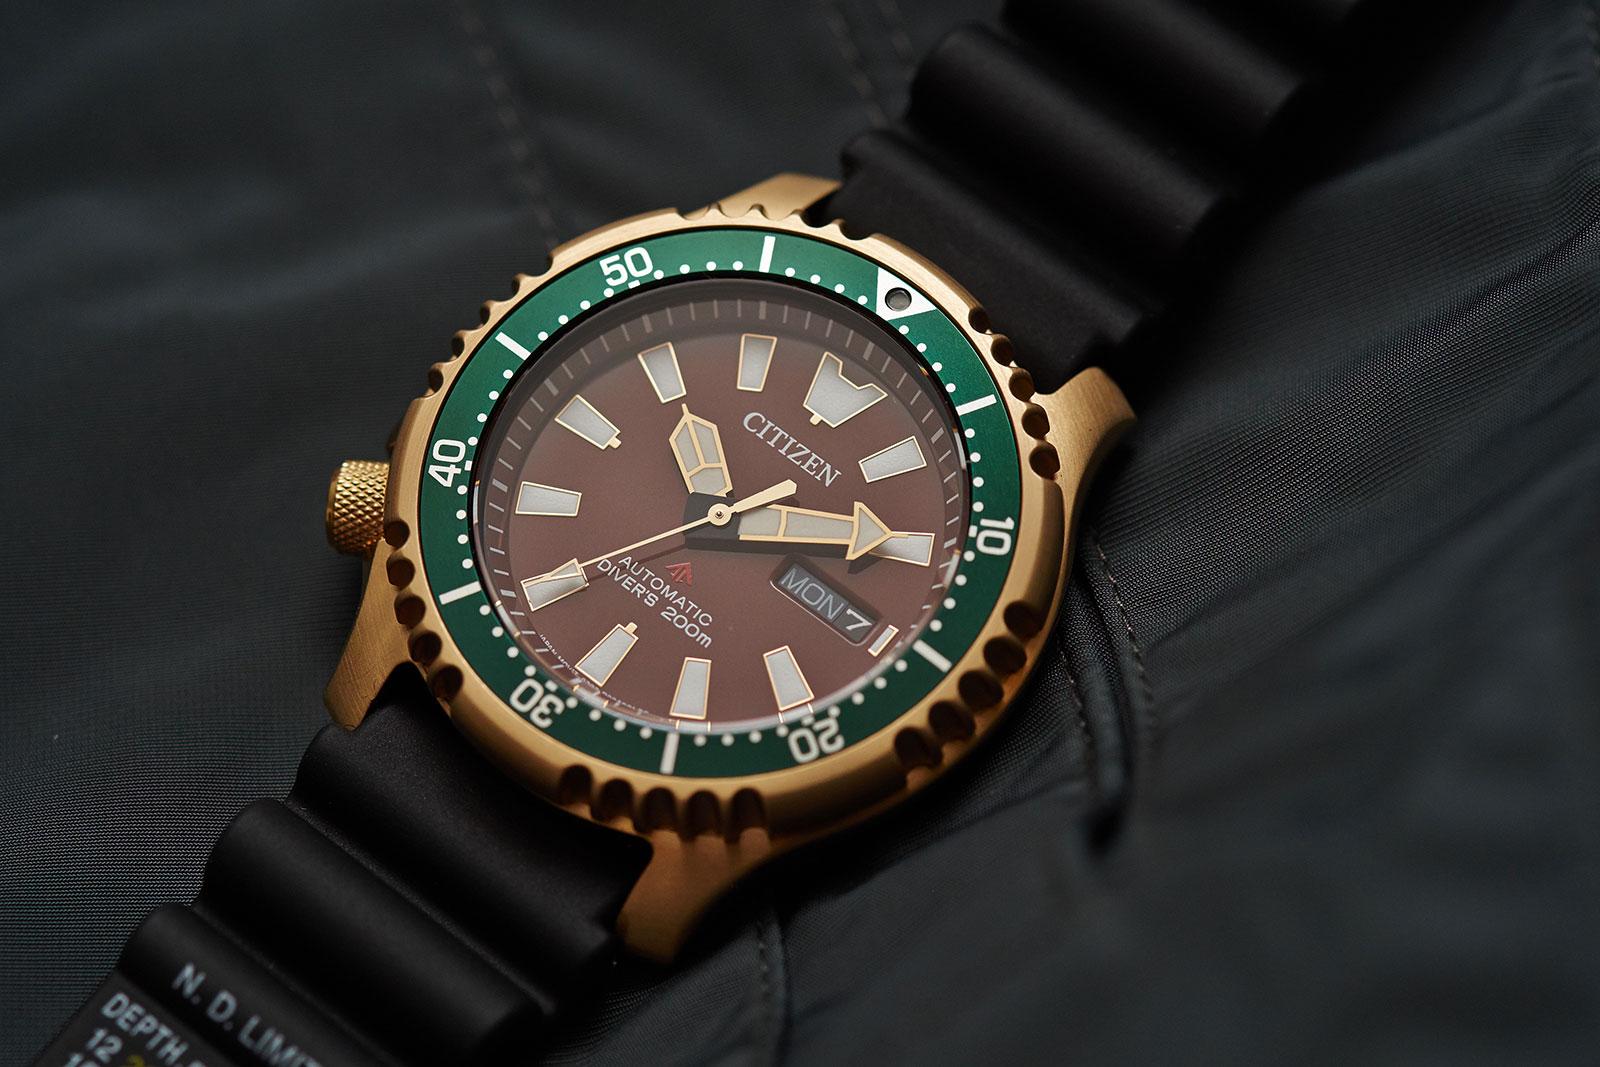 Citizen Promaster Asia edition diver watch 4